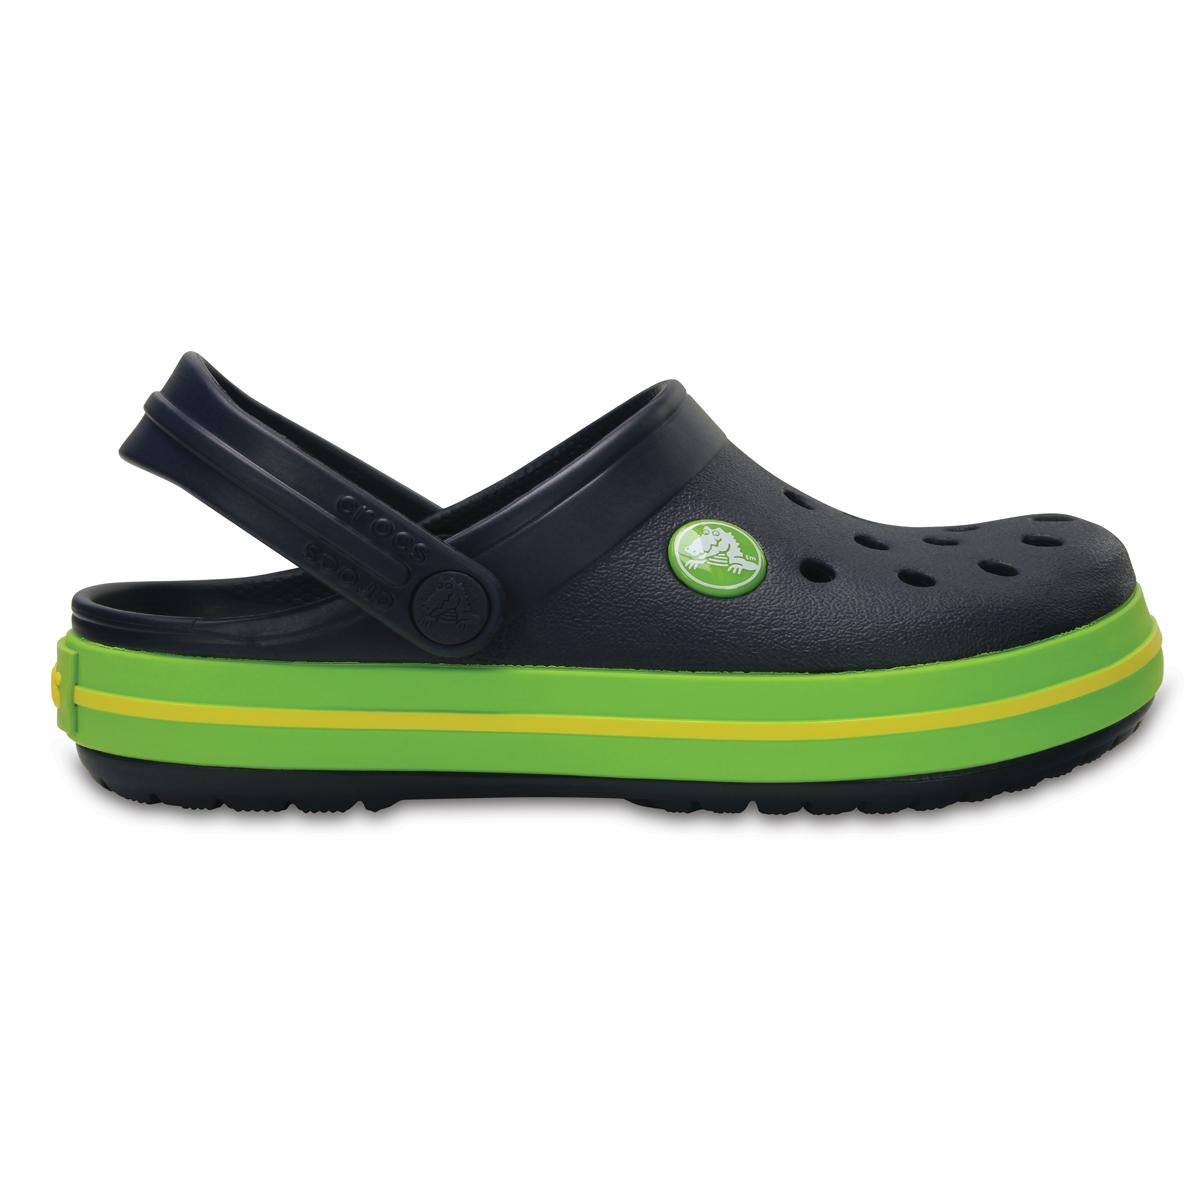 Crocs Crocband Clog K - Lacivert/Volt Yeşil